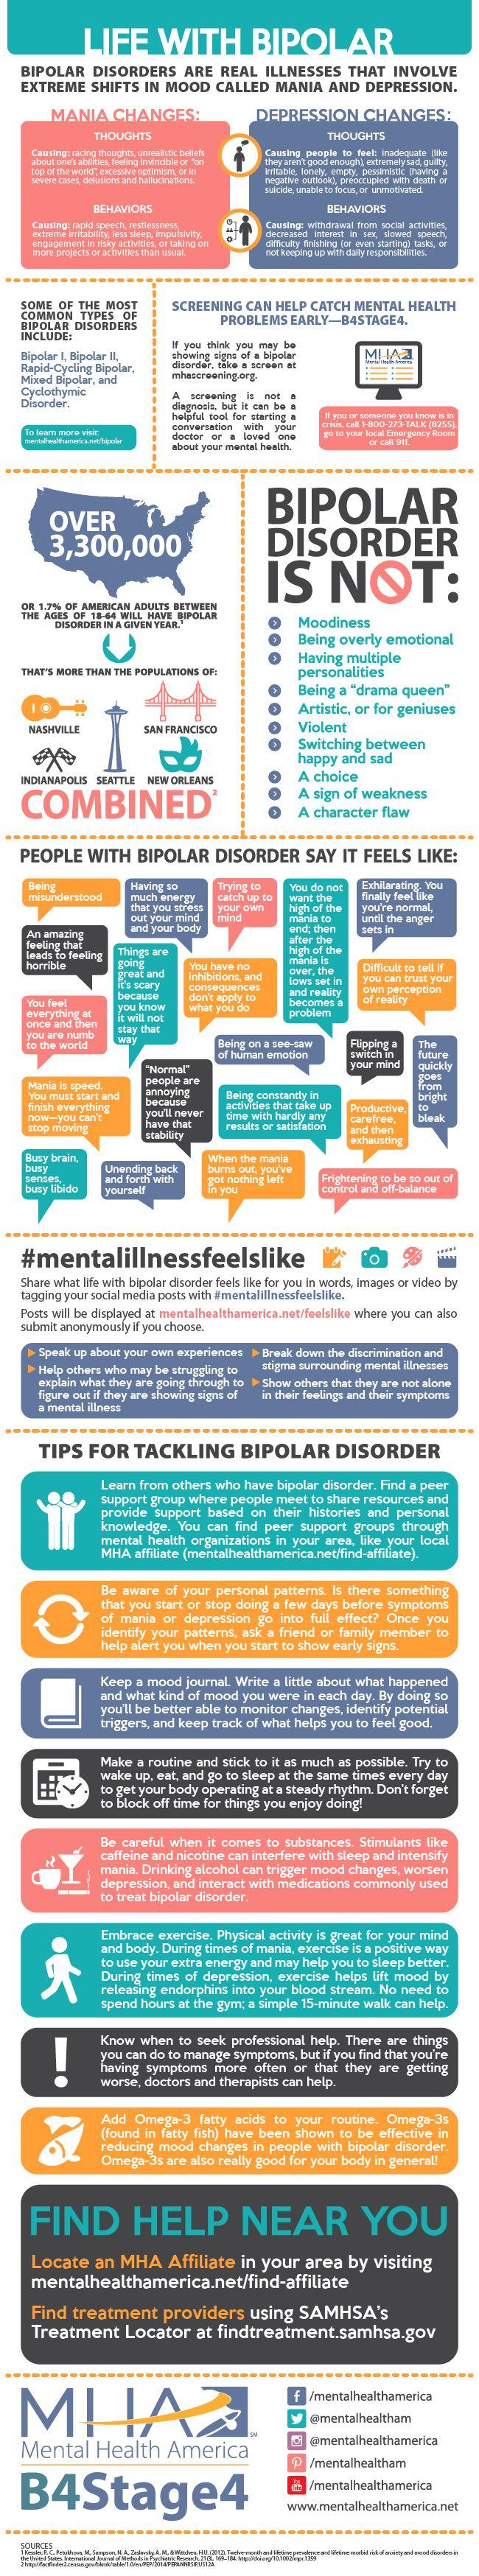 Life with Bipolar - Imgur